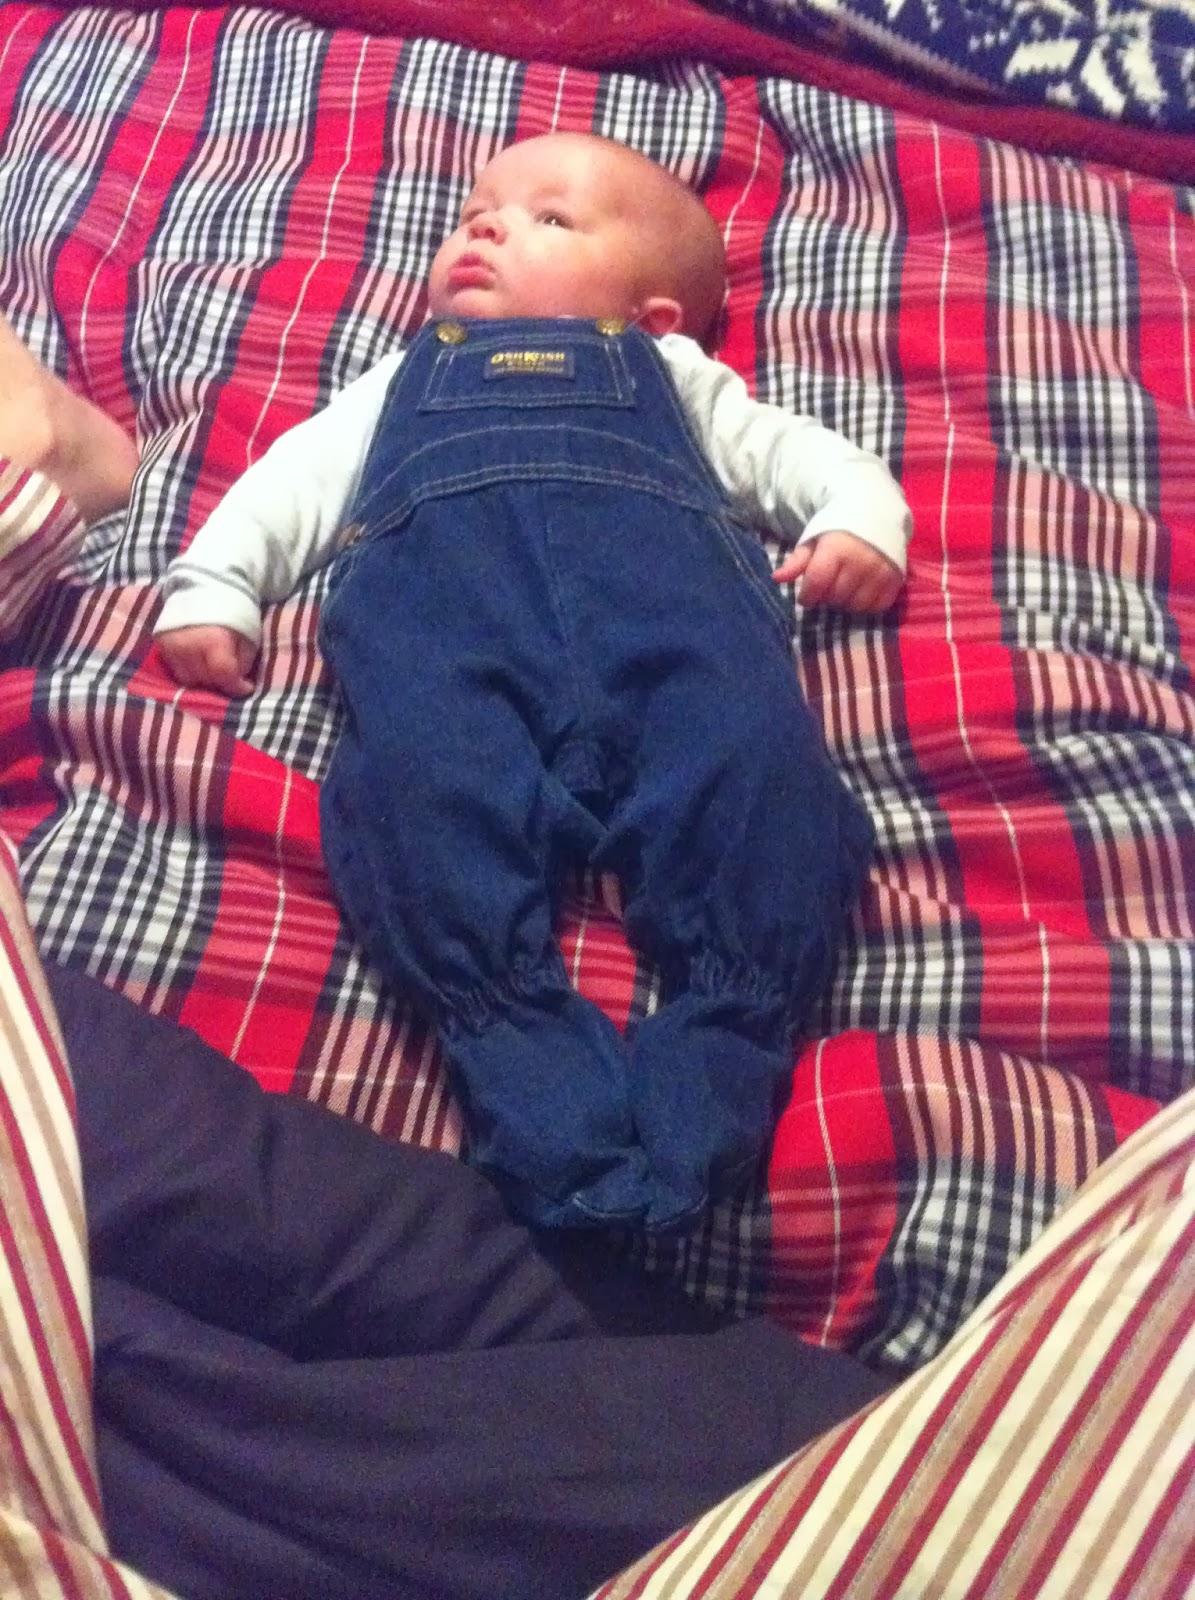 Boys wear overalls #15